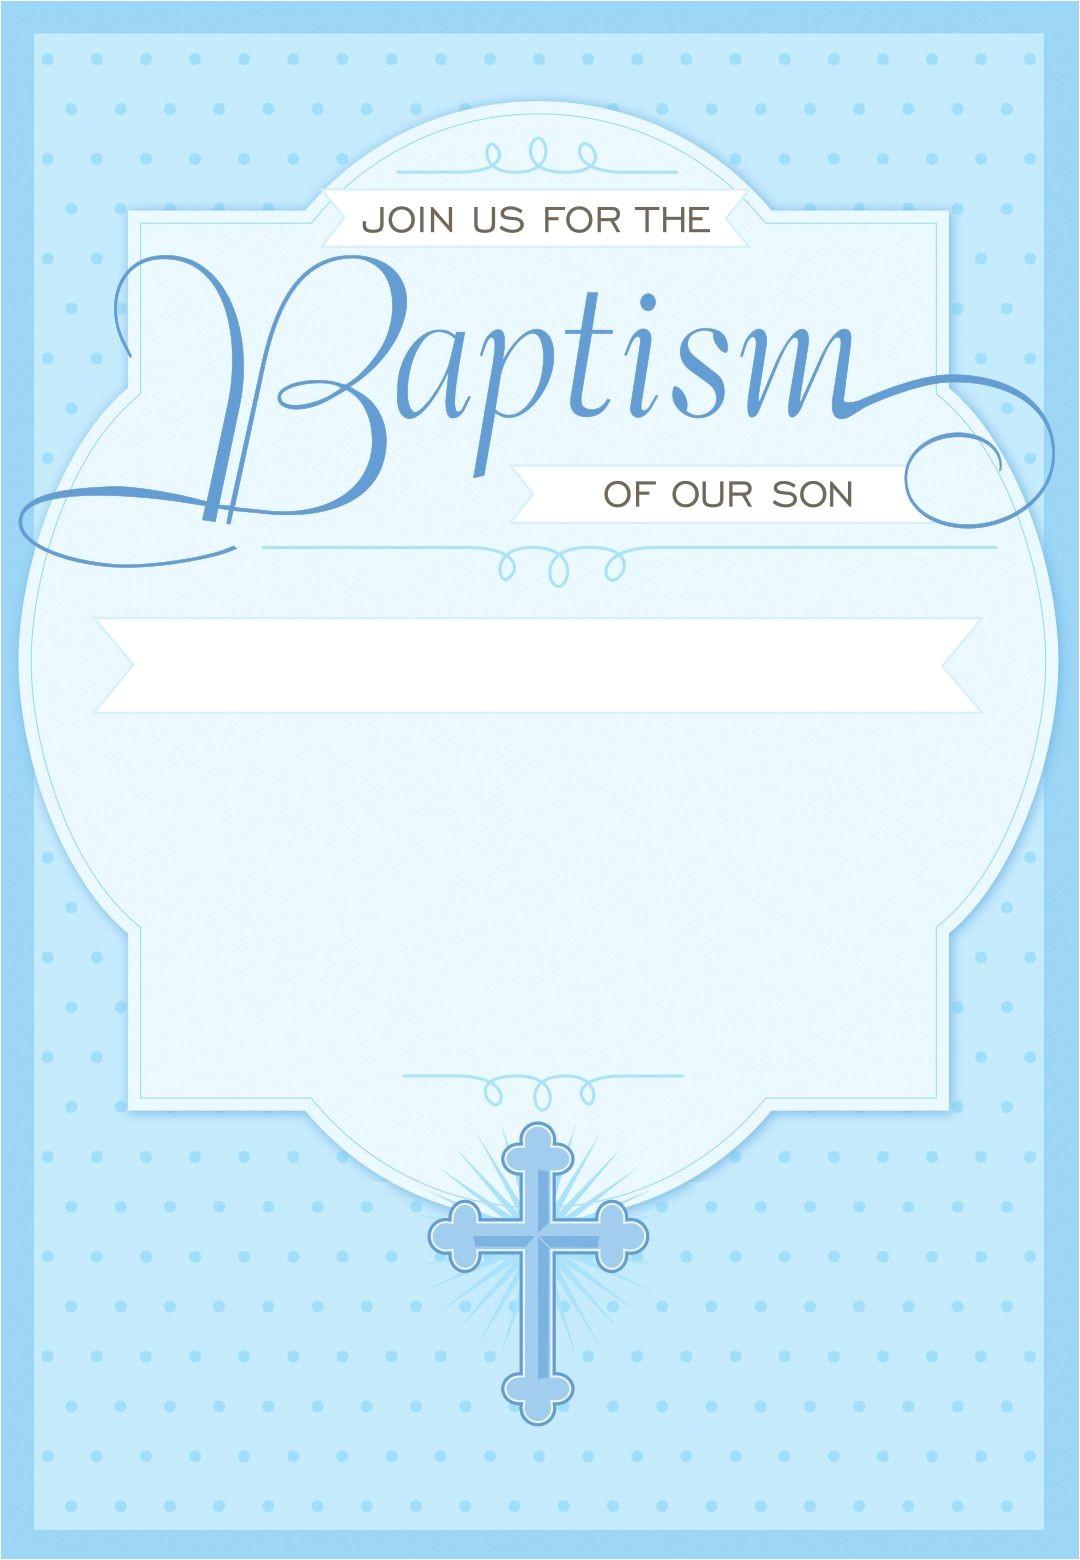 Free Printable Baby Boy Baptism Invitations Dotted Blue Free Printable Baptism & Christening